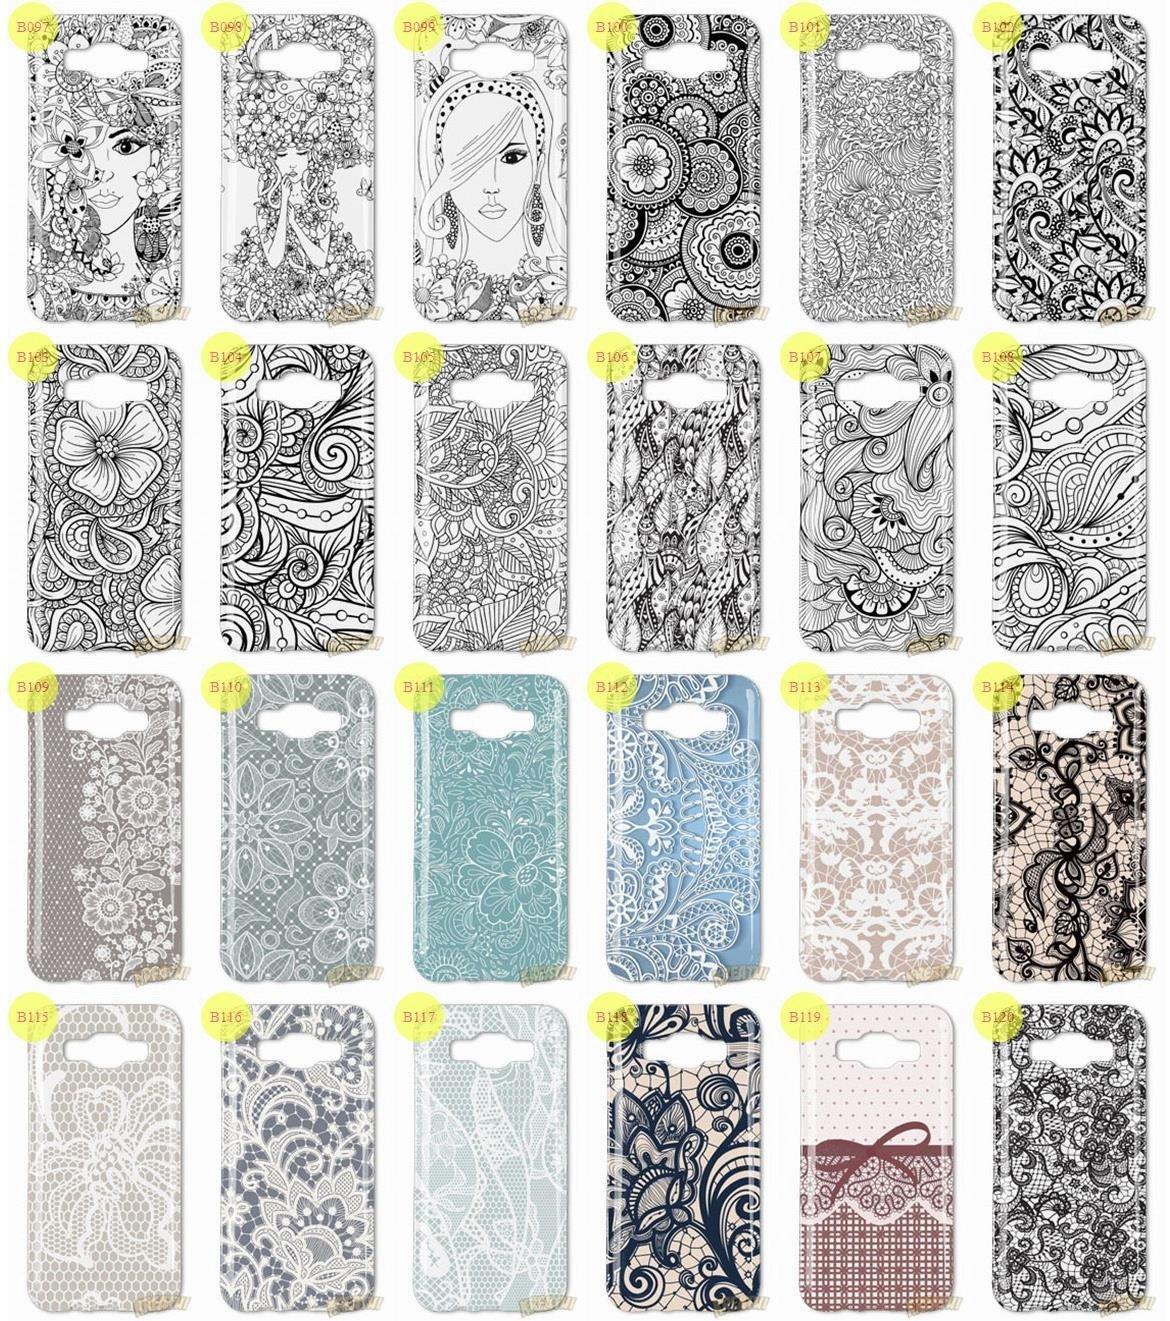 Back Case Gel Kreatui Artcase Samsung Galaxy E5 Sm E500 Glass 9h Click To Zoom